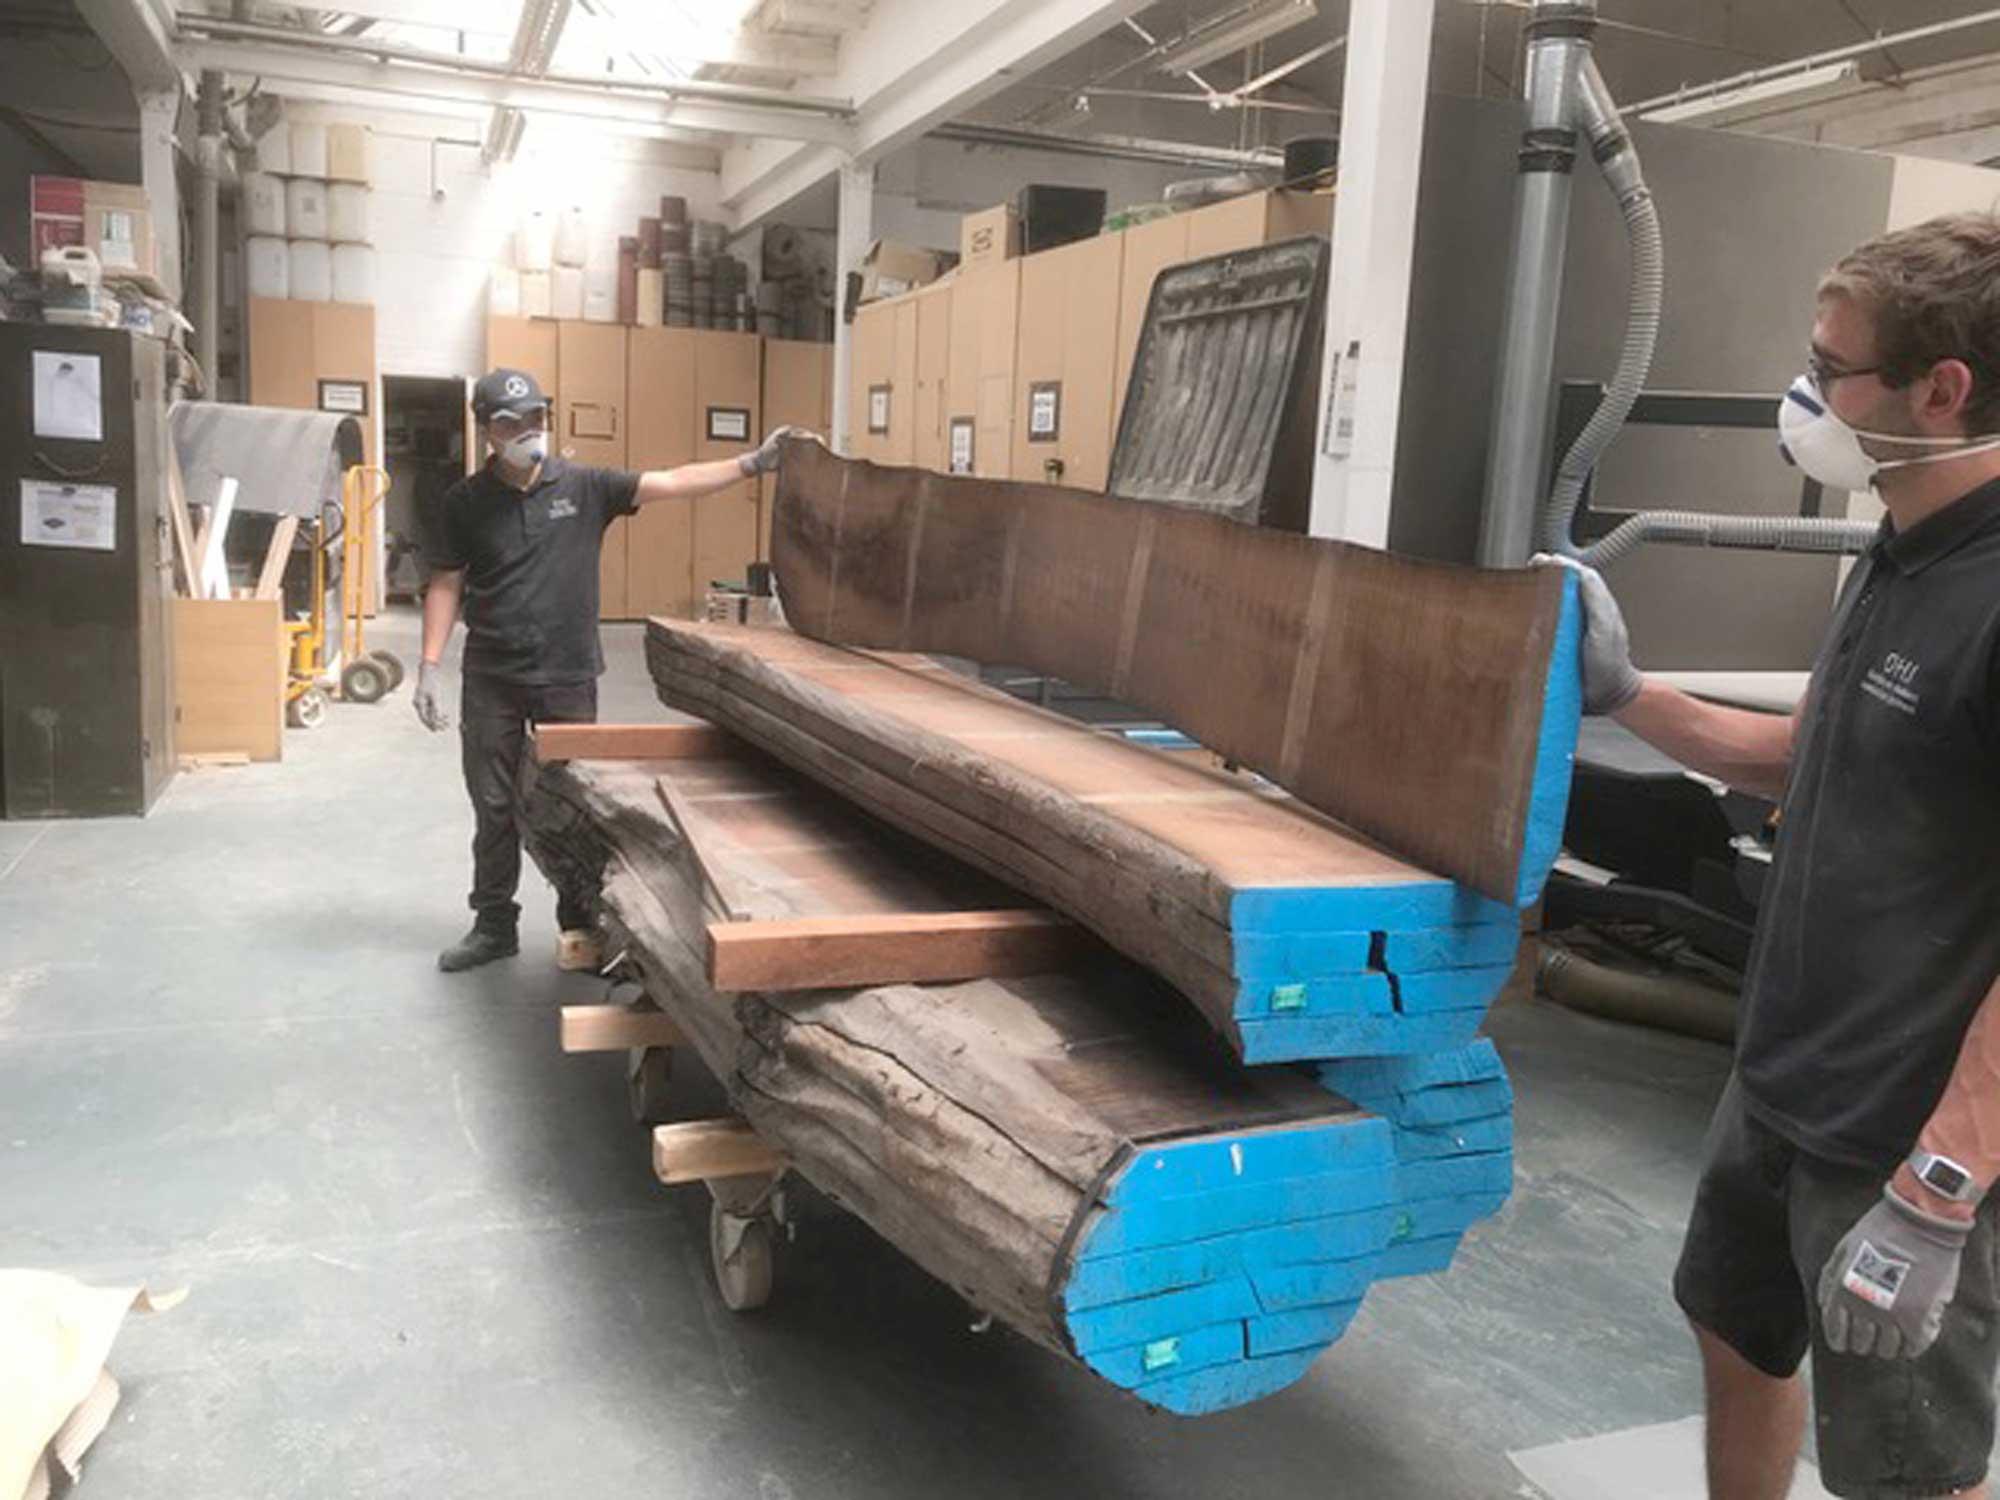 kensington-house-openstudio-architects-joinery-workshop